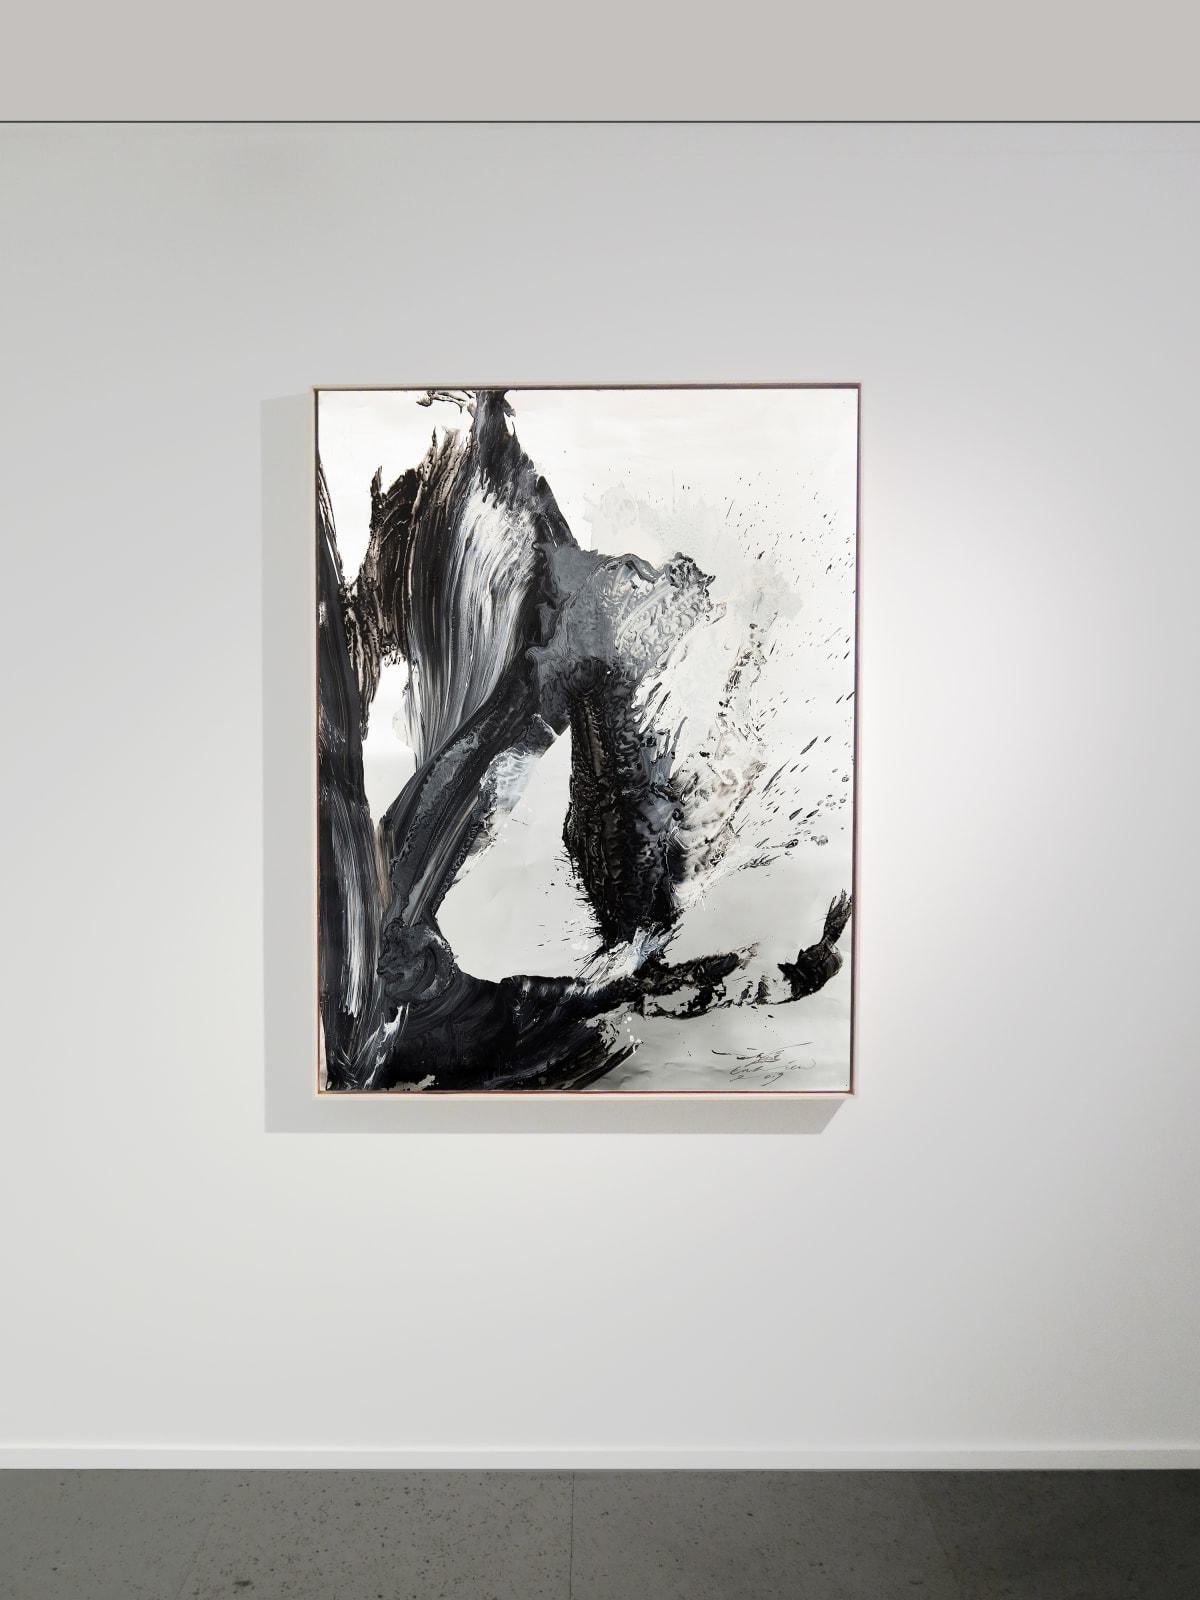 C. N. Liew 劉慶倫, Border I 臨界之一, 2019